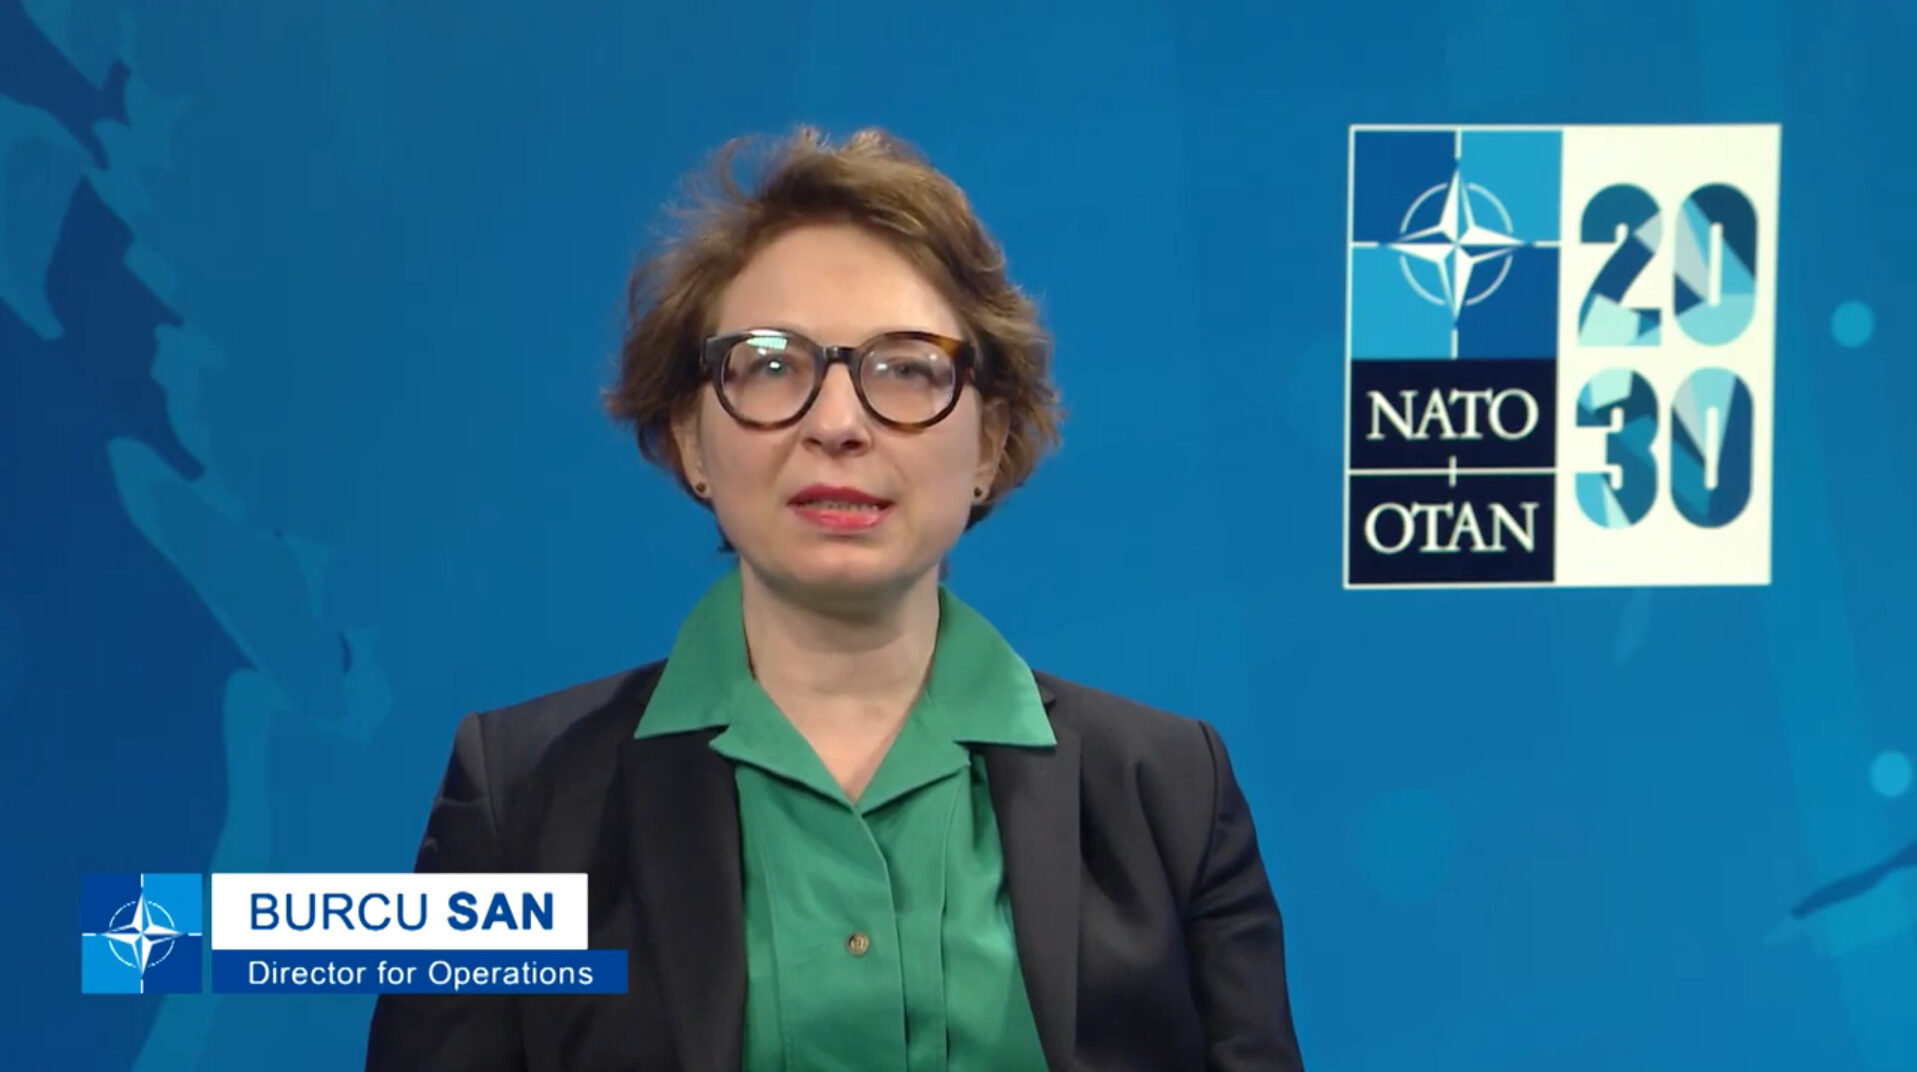 Lecture by Burcu San: Role of NATO in the Baltic Sea Region